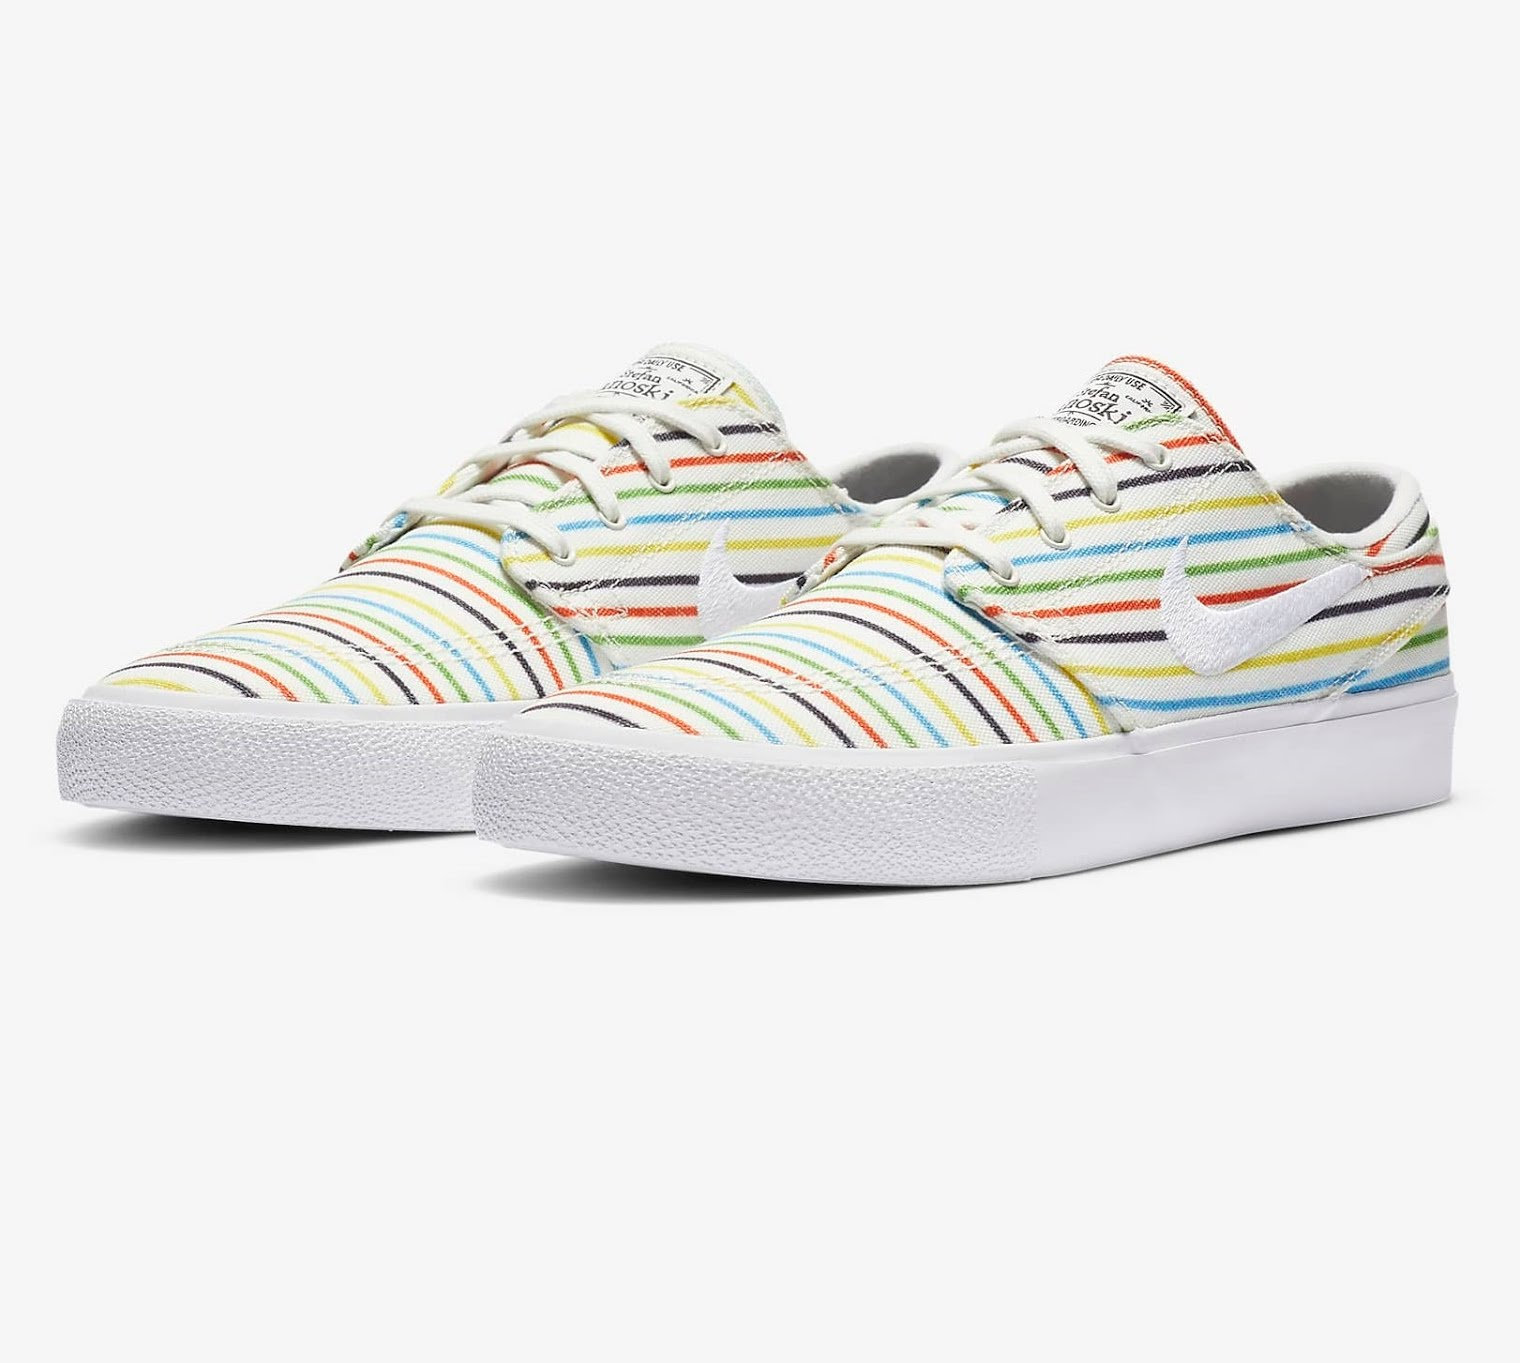 Soldes Nike - Chaussures en toile Nike SB Zoom Stefan Janoski Canvas RM Premium